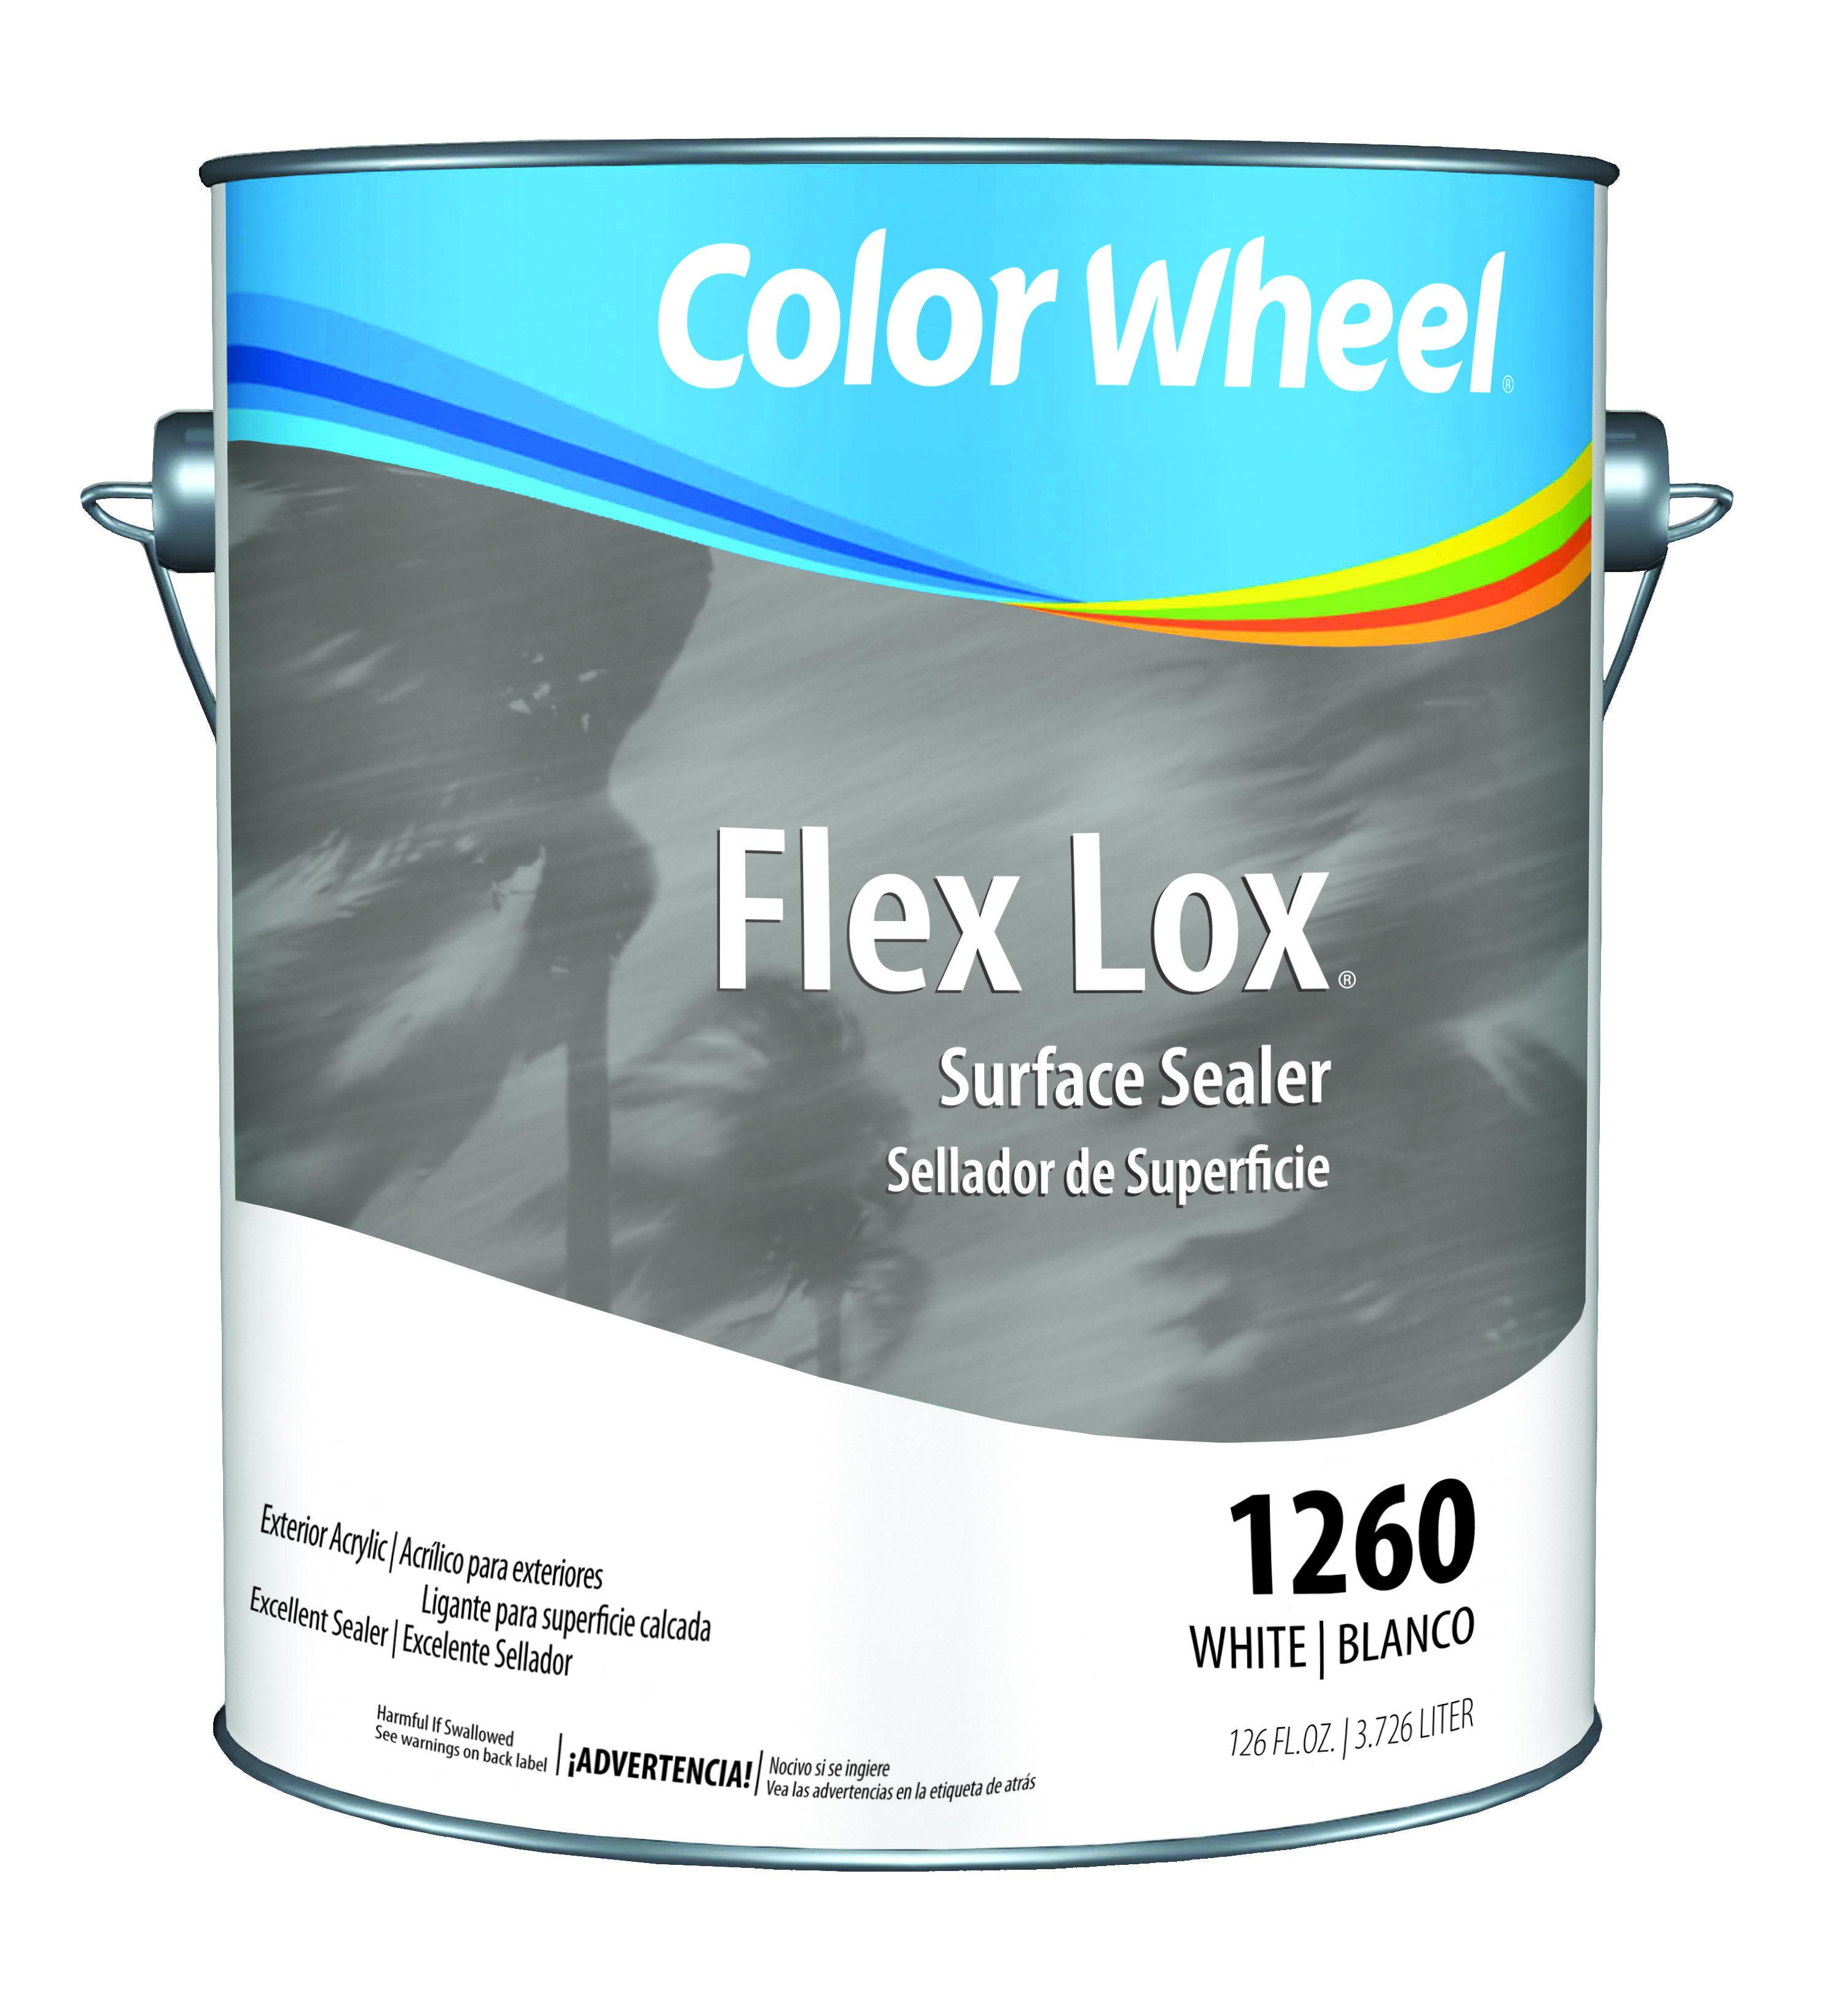 Color Wheel Paint Colorwheelbrand On Pinterest